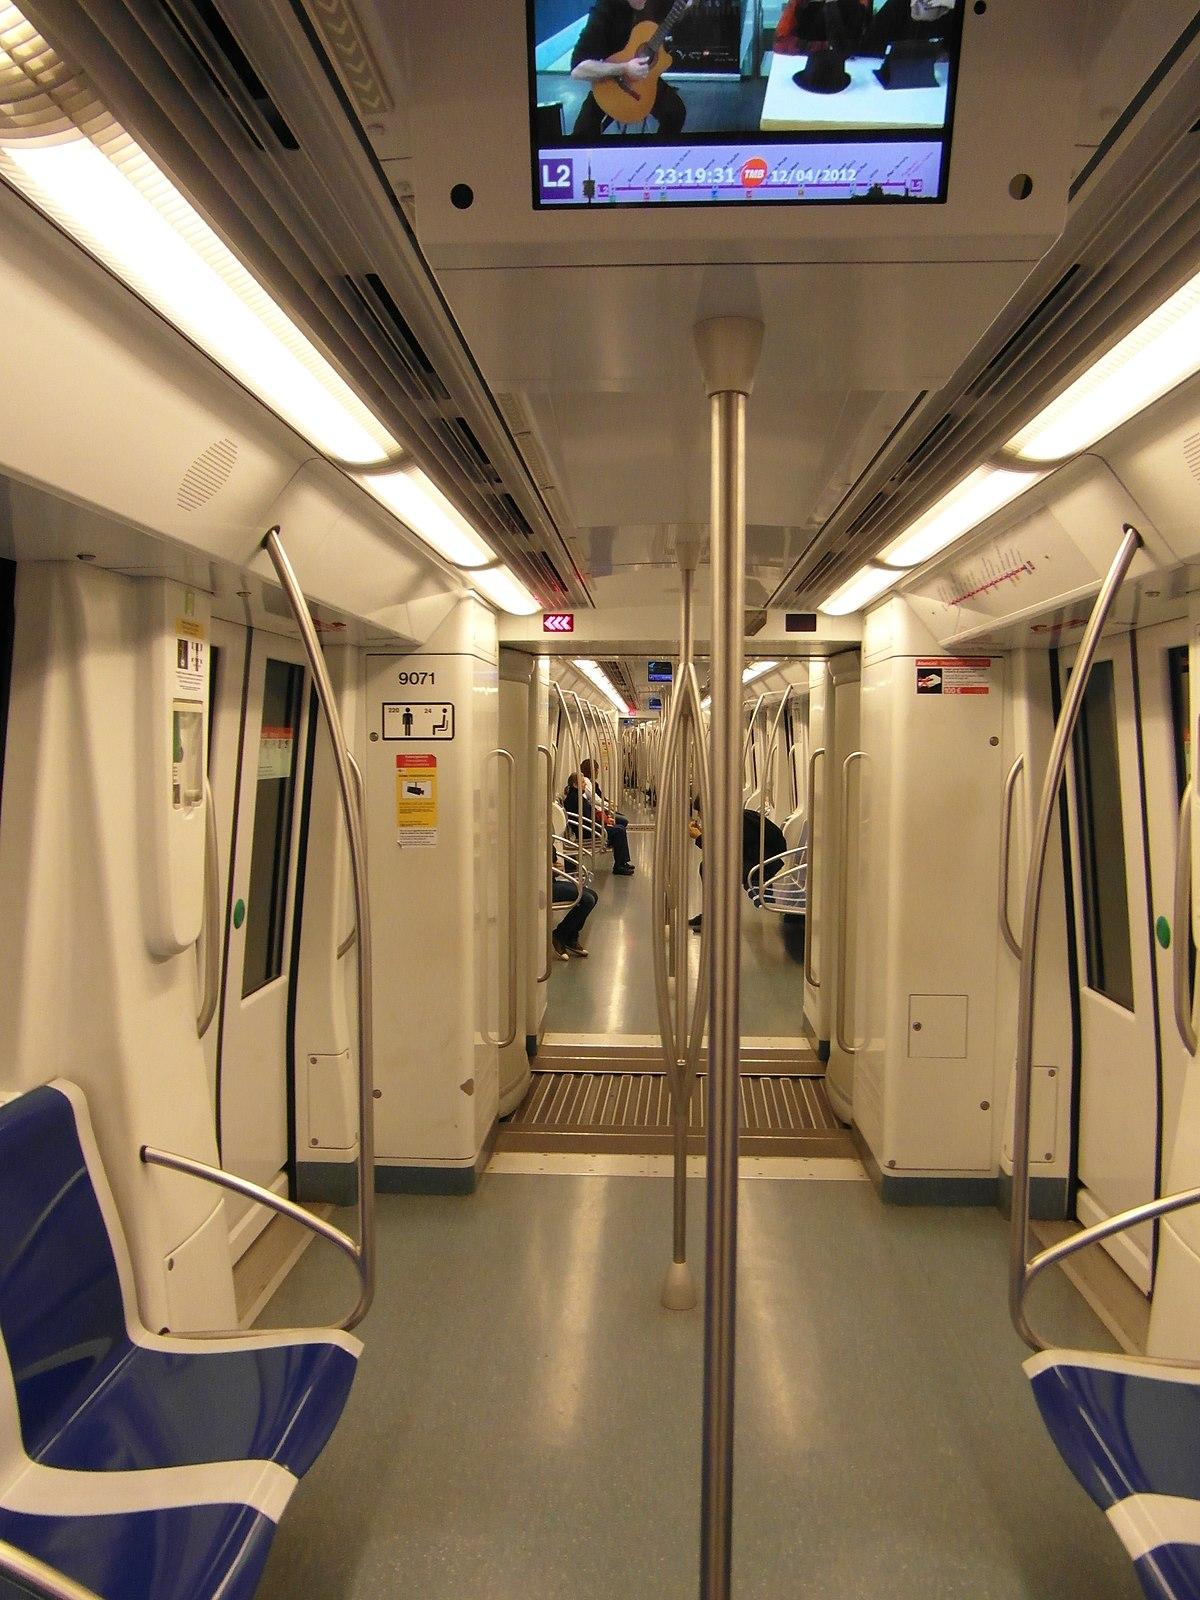 File:Barcelona - Inside Metro - L2 (7510338060) jpg